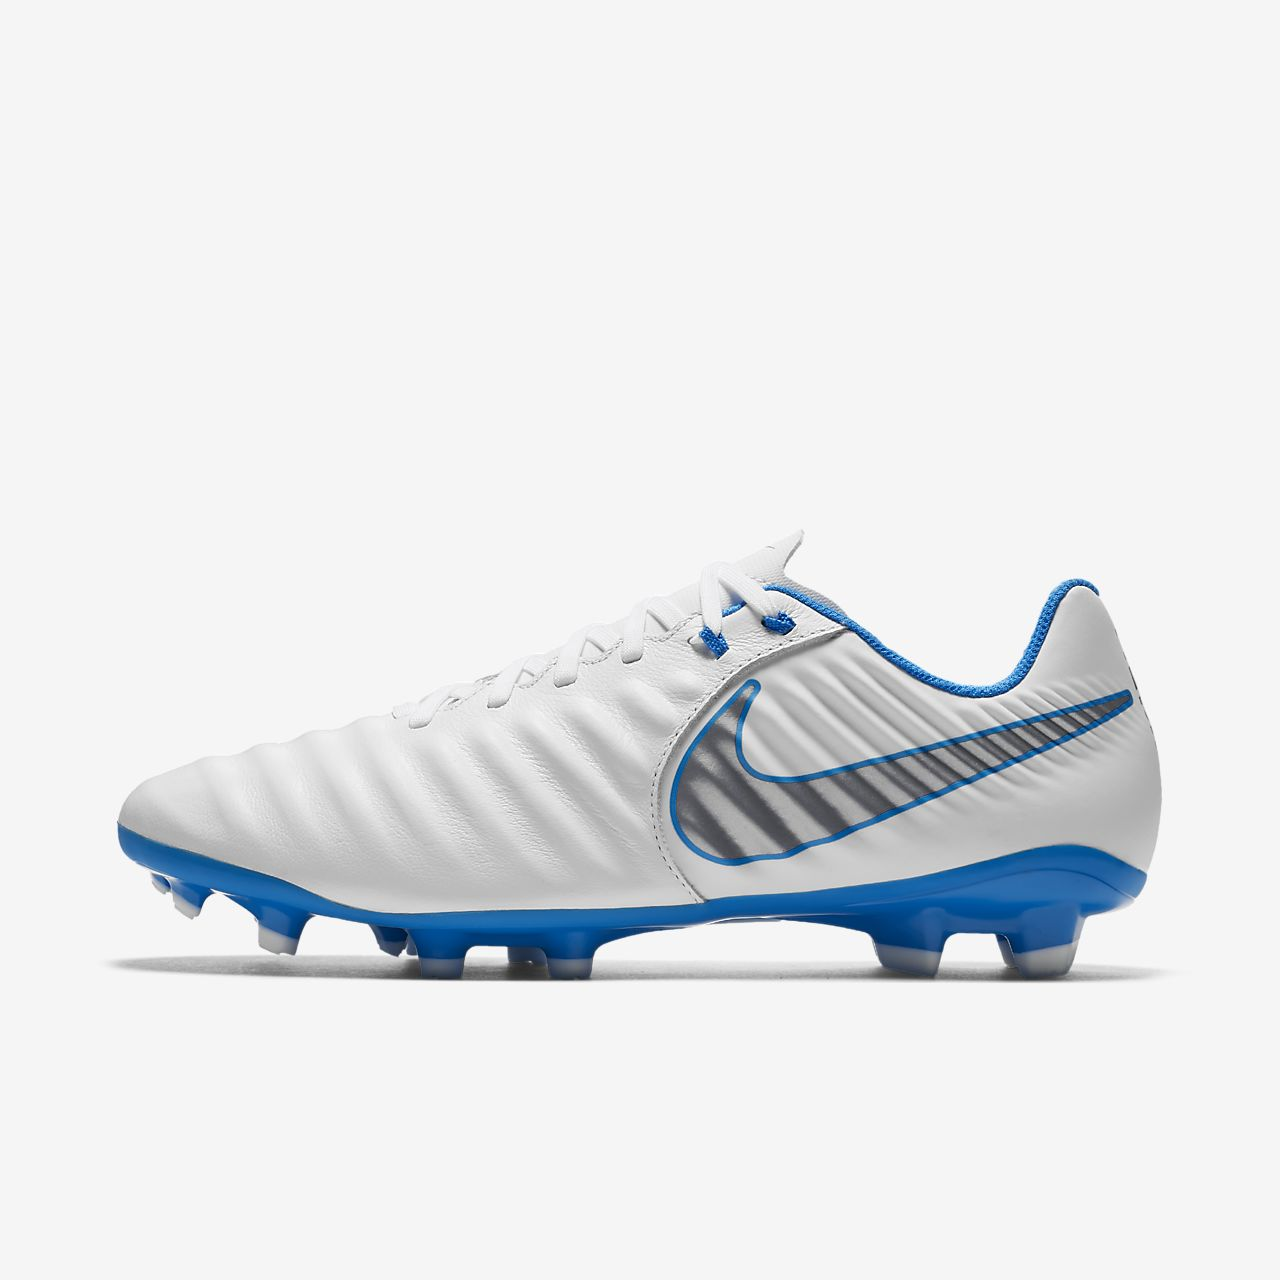 ... best price nike tiempo legend vii firm ground football boot 08e55 e4d2b d10e31c1f4507